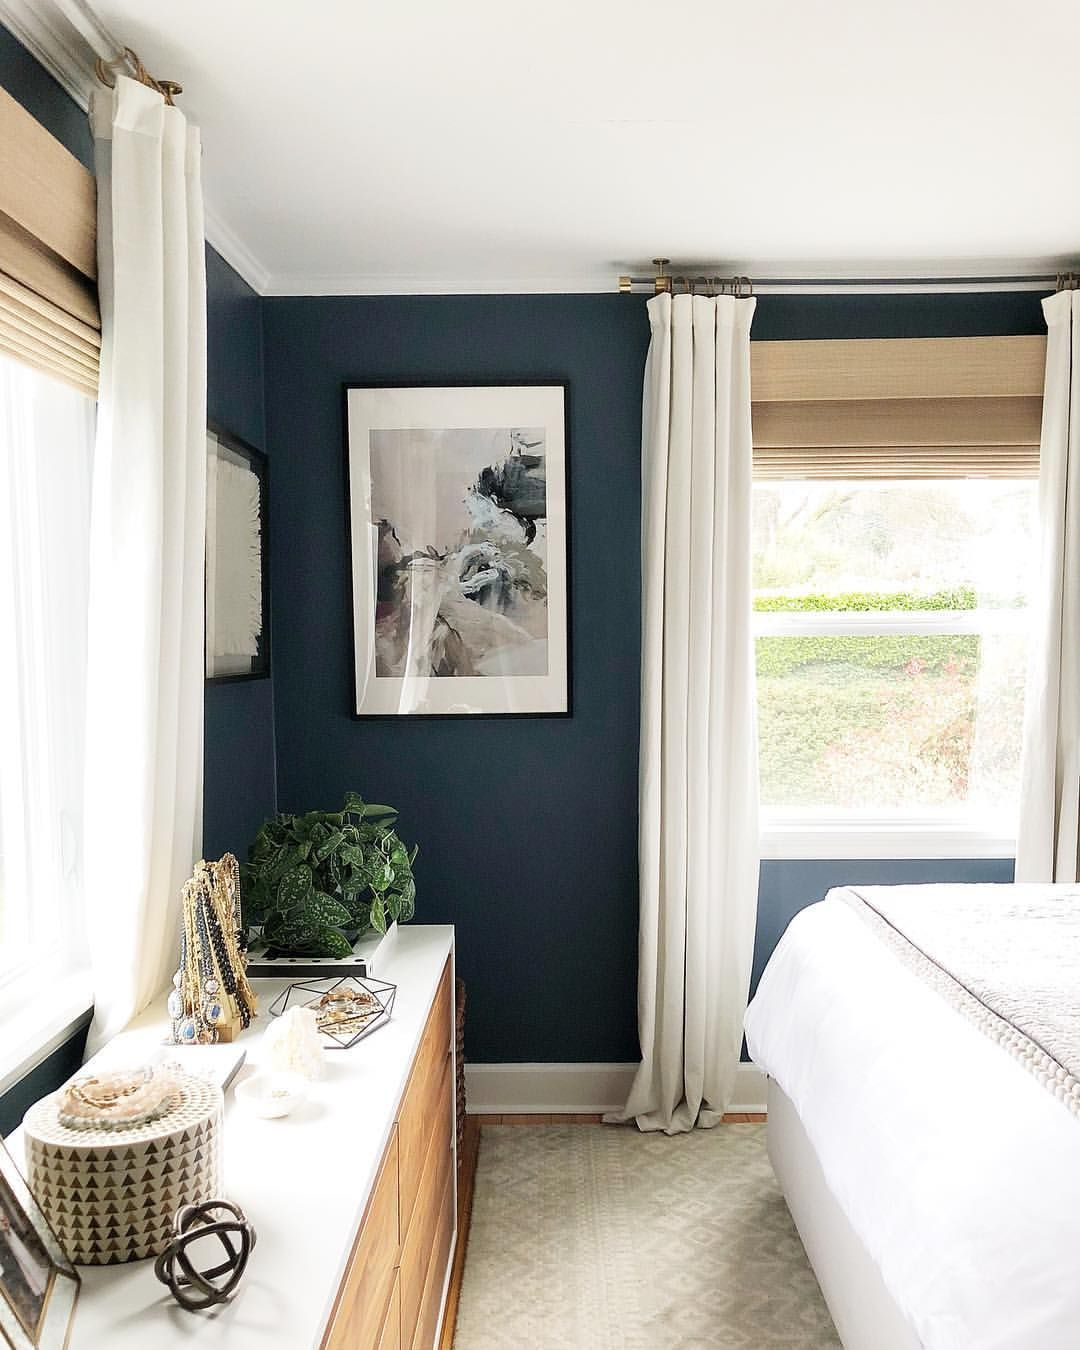 14 Remarkable Home Decor Ideas 2018 Stupefying Ideas In 2020 Home Decor Bedroom Home Bedroom Home